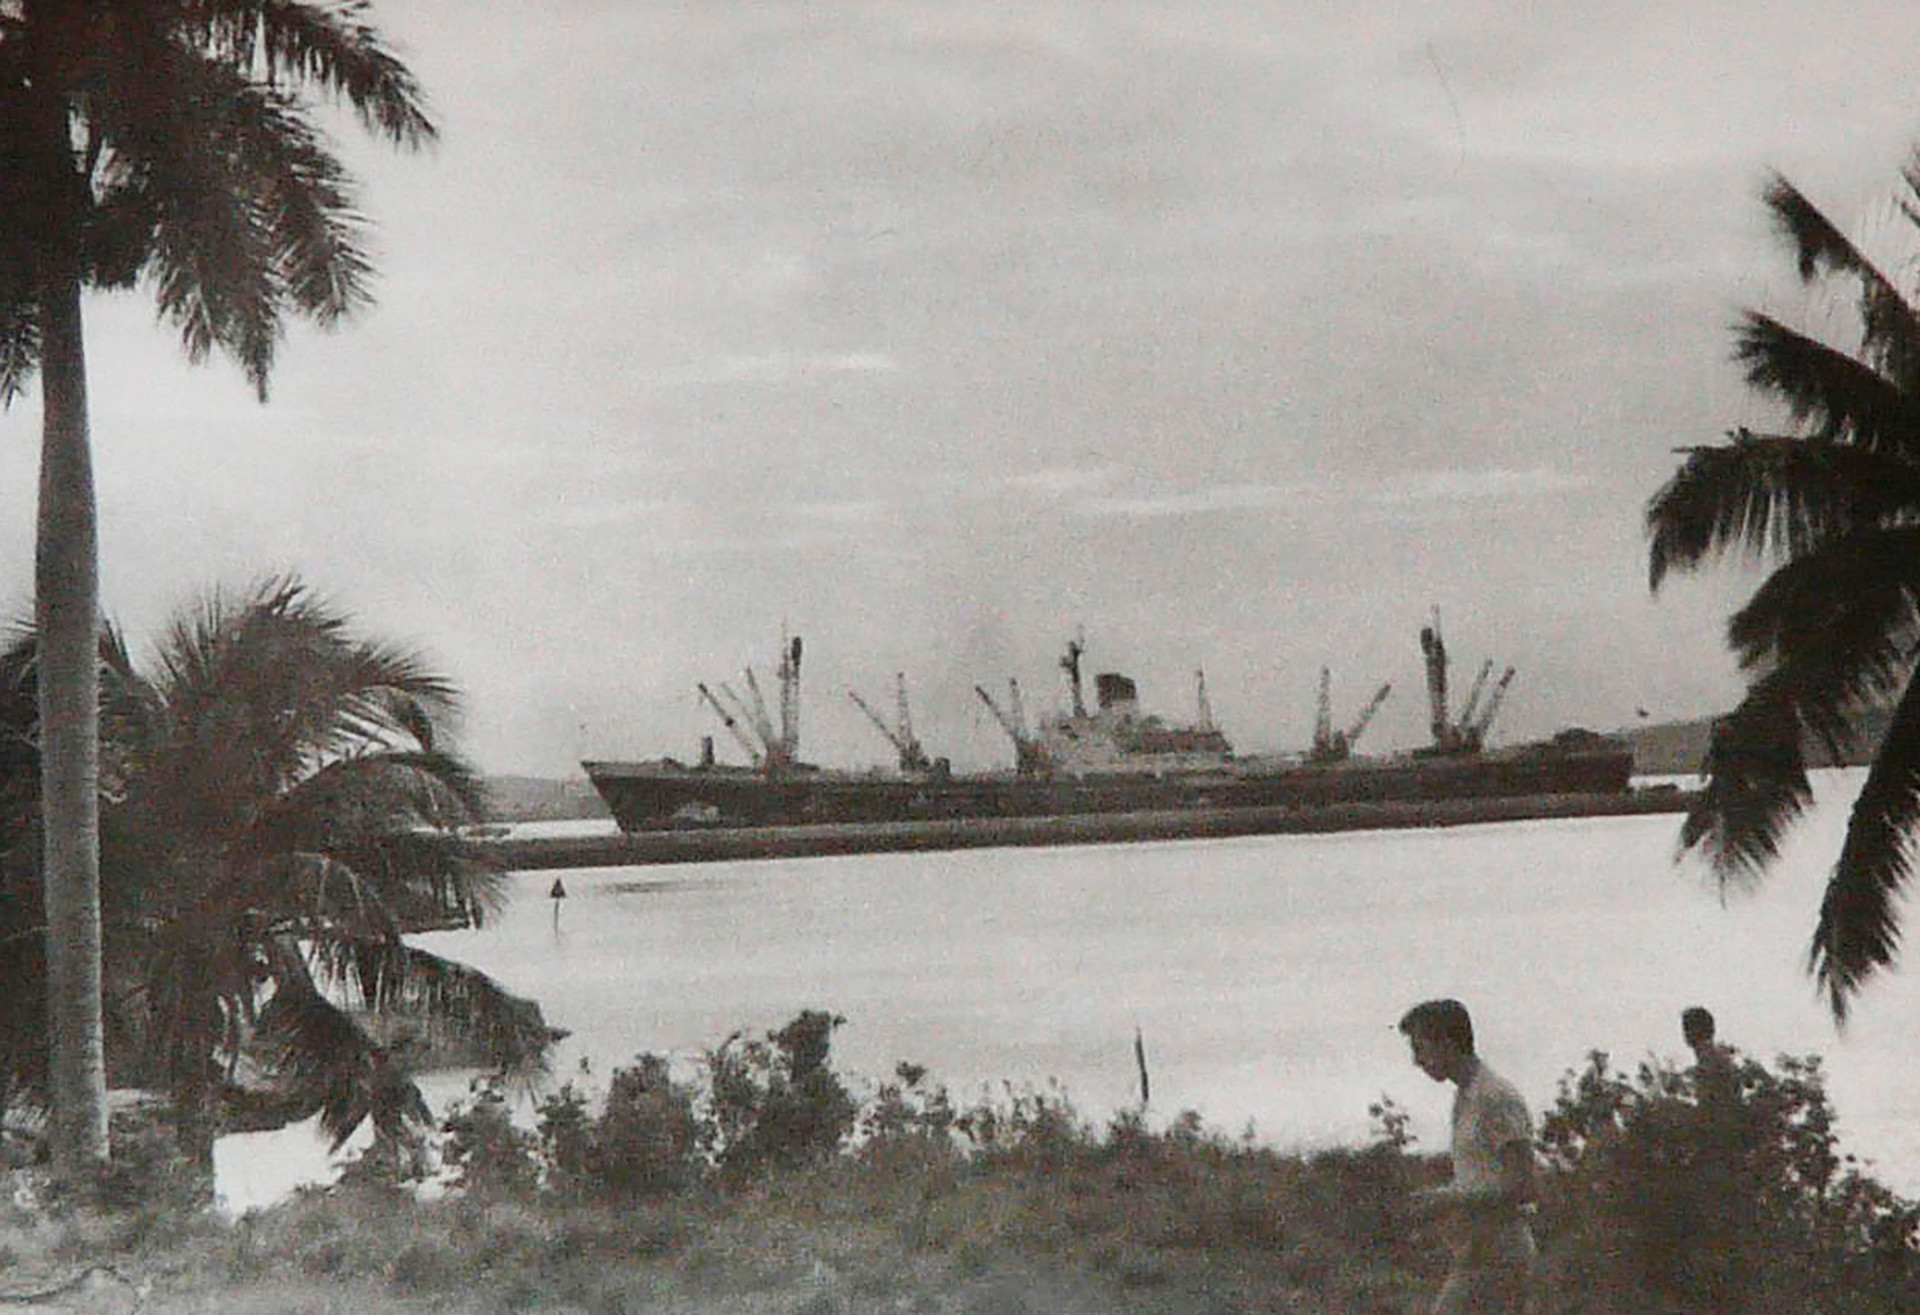 Carguero soviético en Cuba.